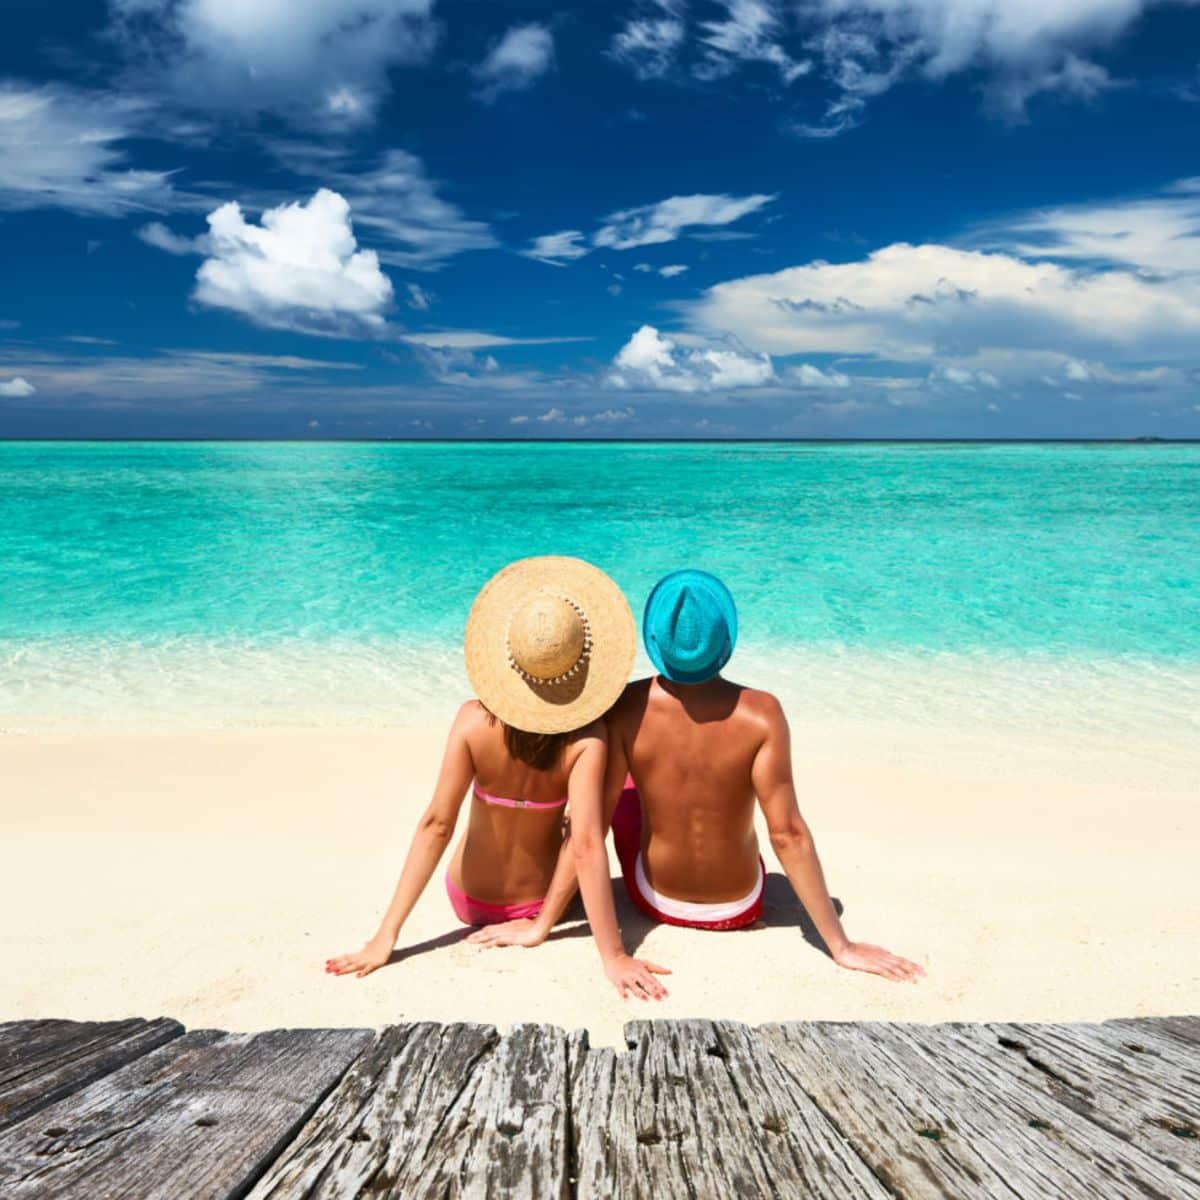 Partir en voyage : quelle destination choisir ?